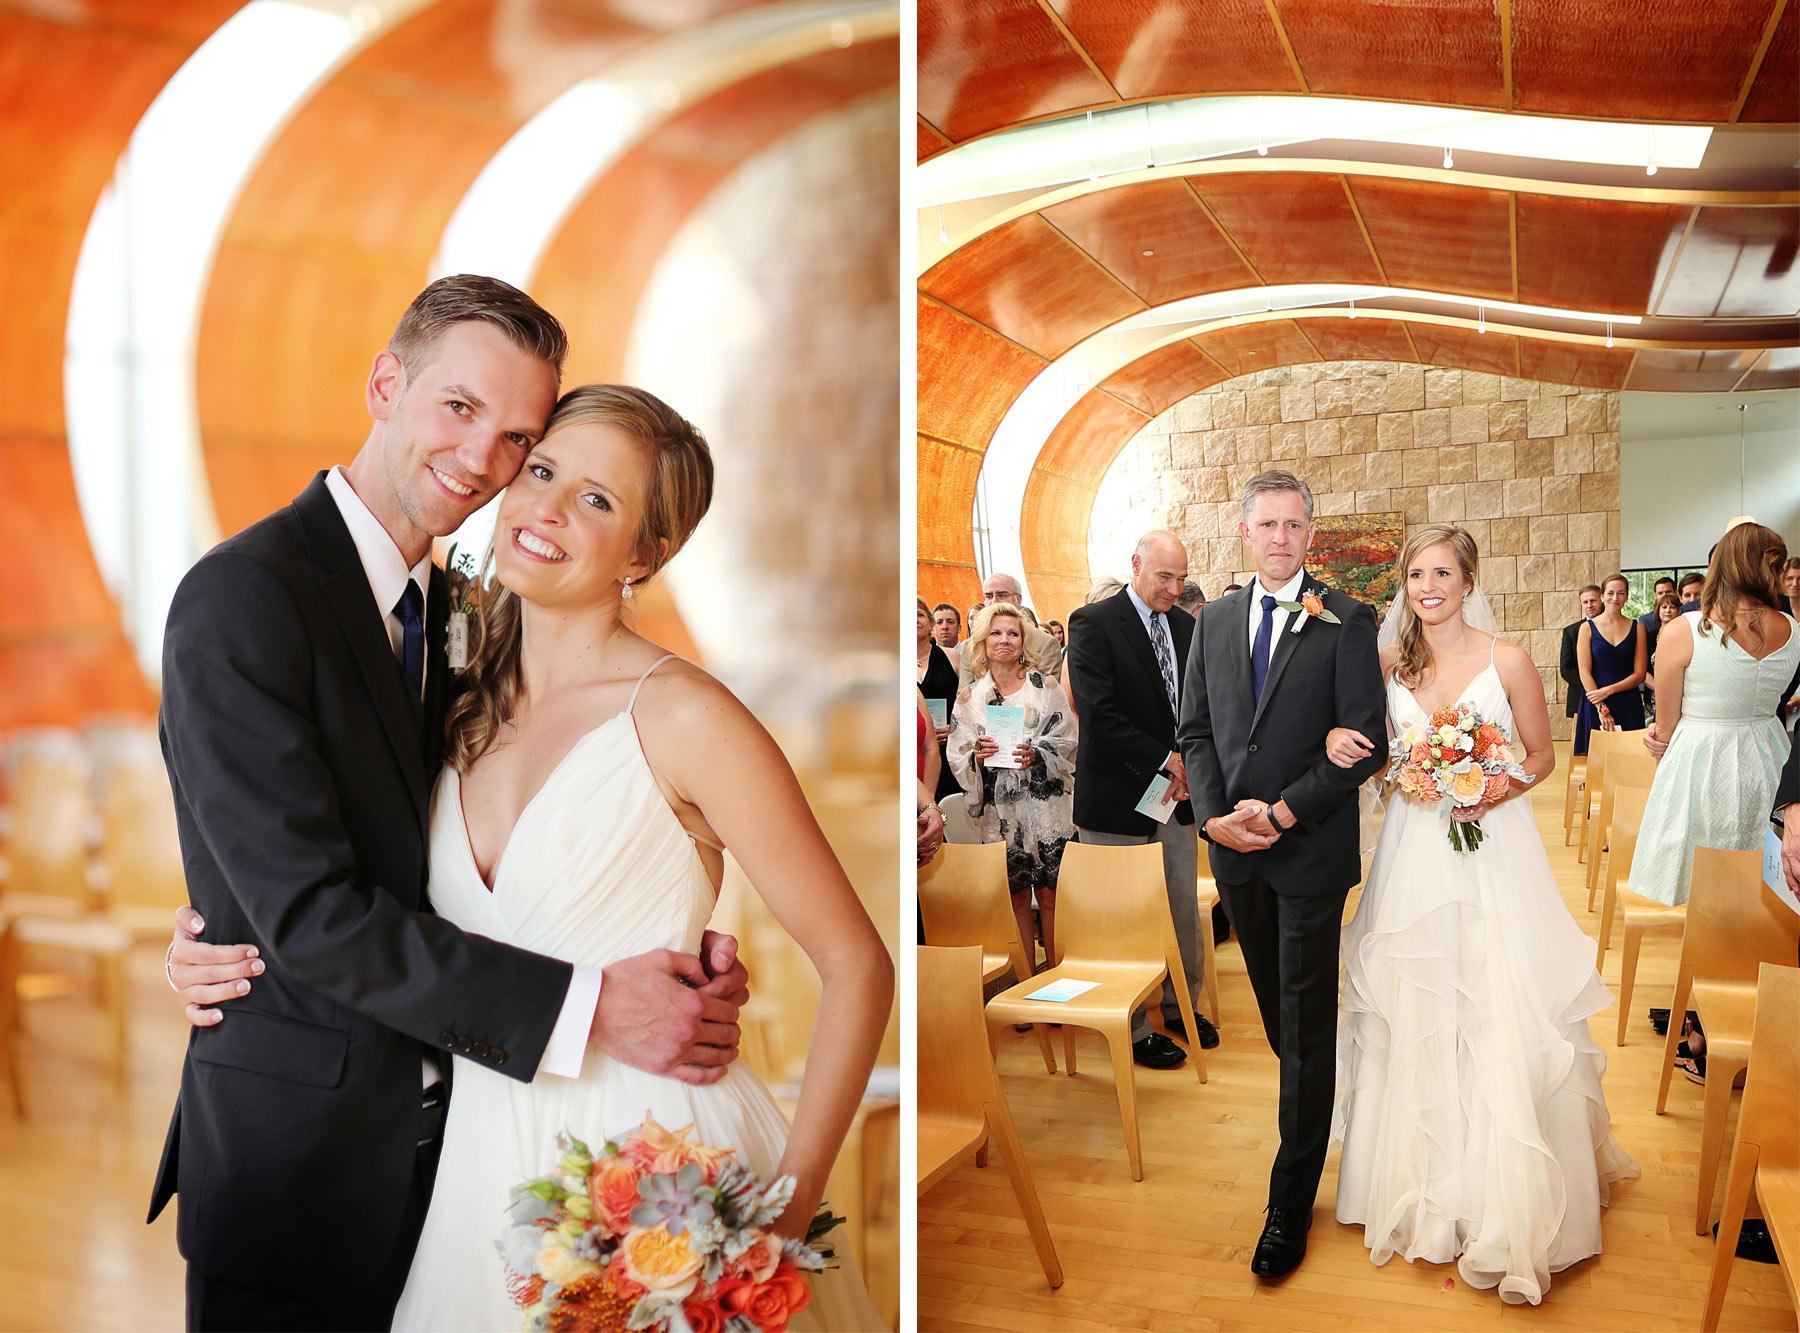 07-Minneapolis-Minnesota-Wedding-Photography-by-Vick-Photography-Bigelow-Chapel-Ceremony-Jess-&-Jake.jpg